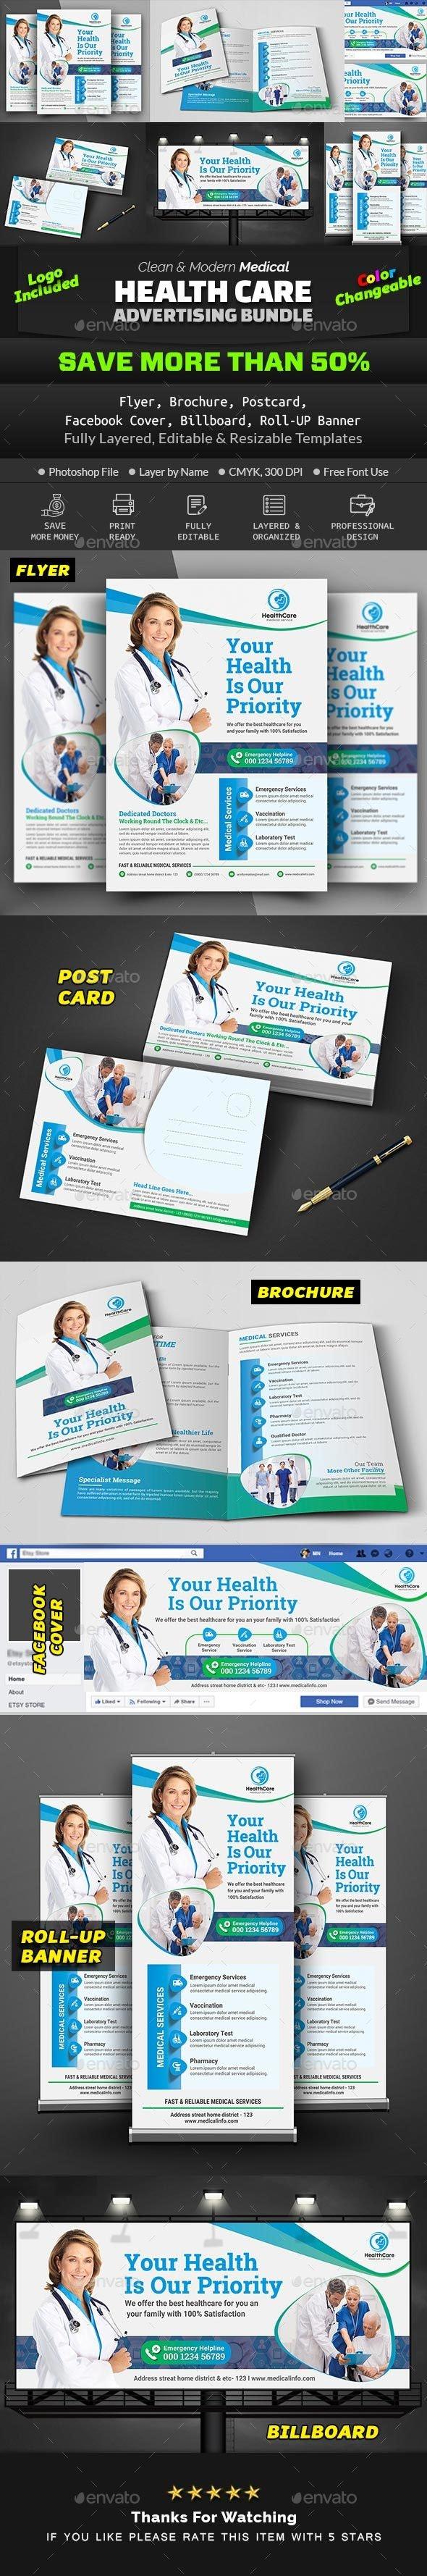 Medical Health Care Advertising Bundle - Print Templates